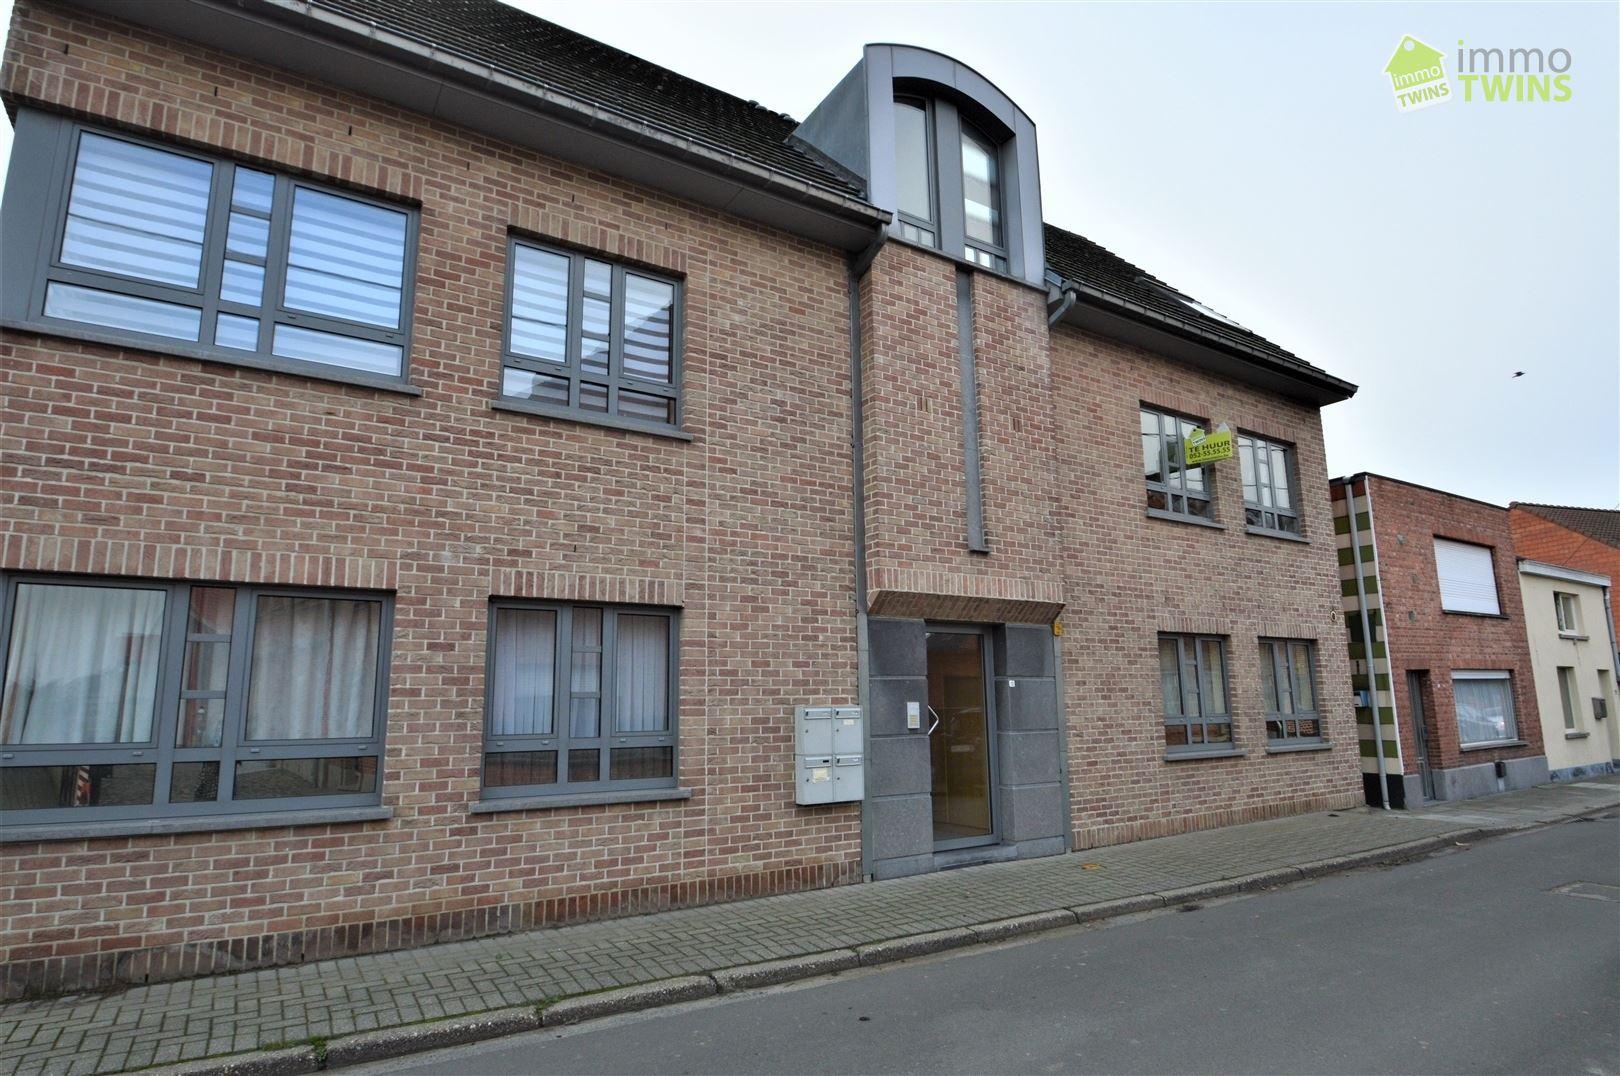 Foto 2 : Appartement te 9200 BAASRODE (België) - Prijs € 450